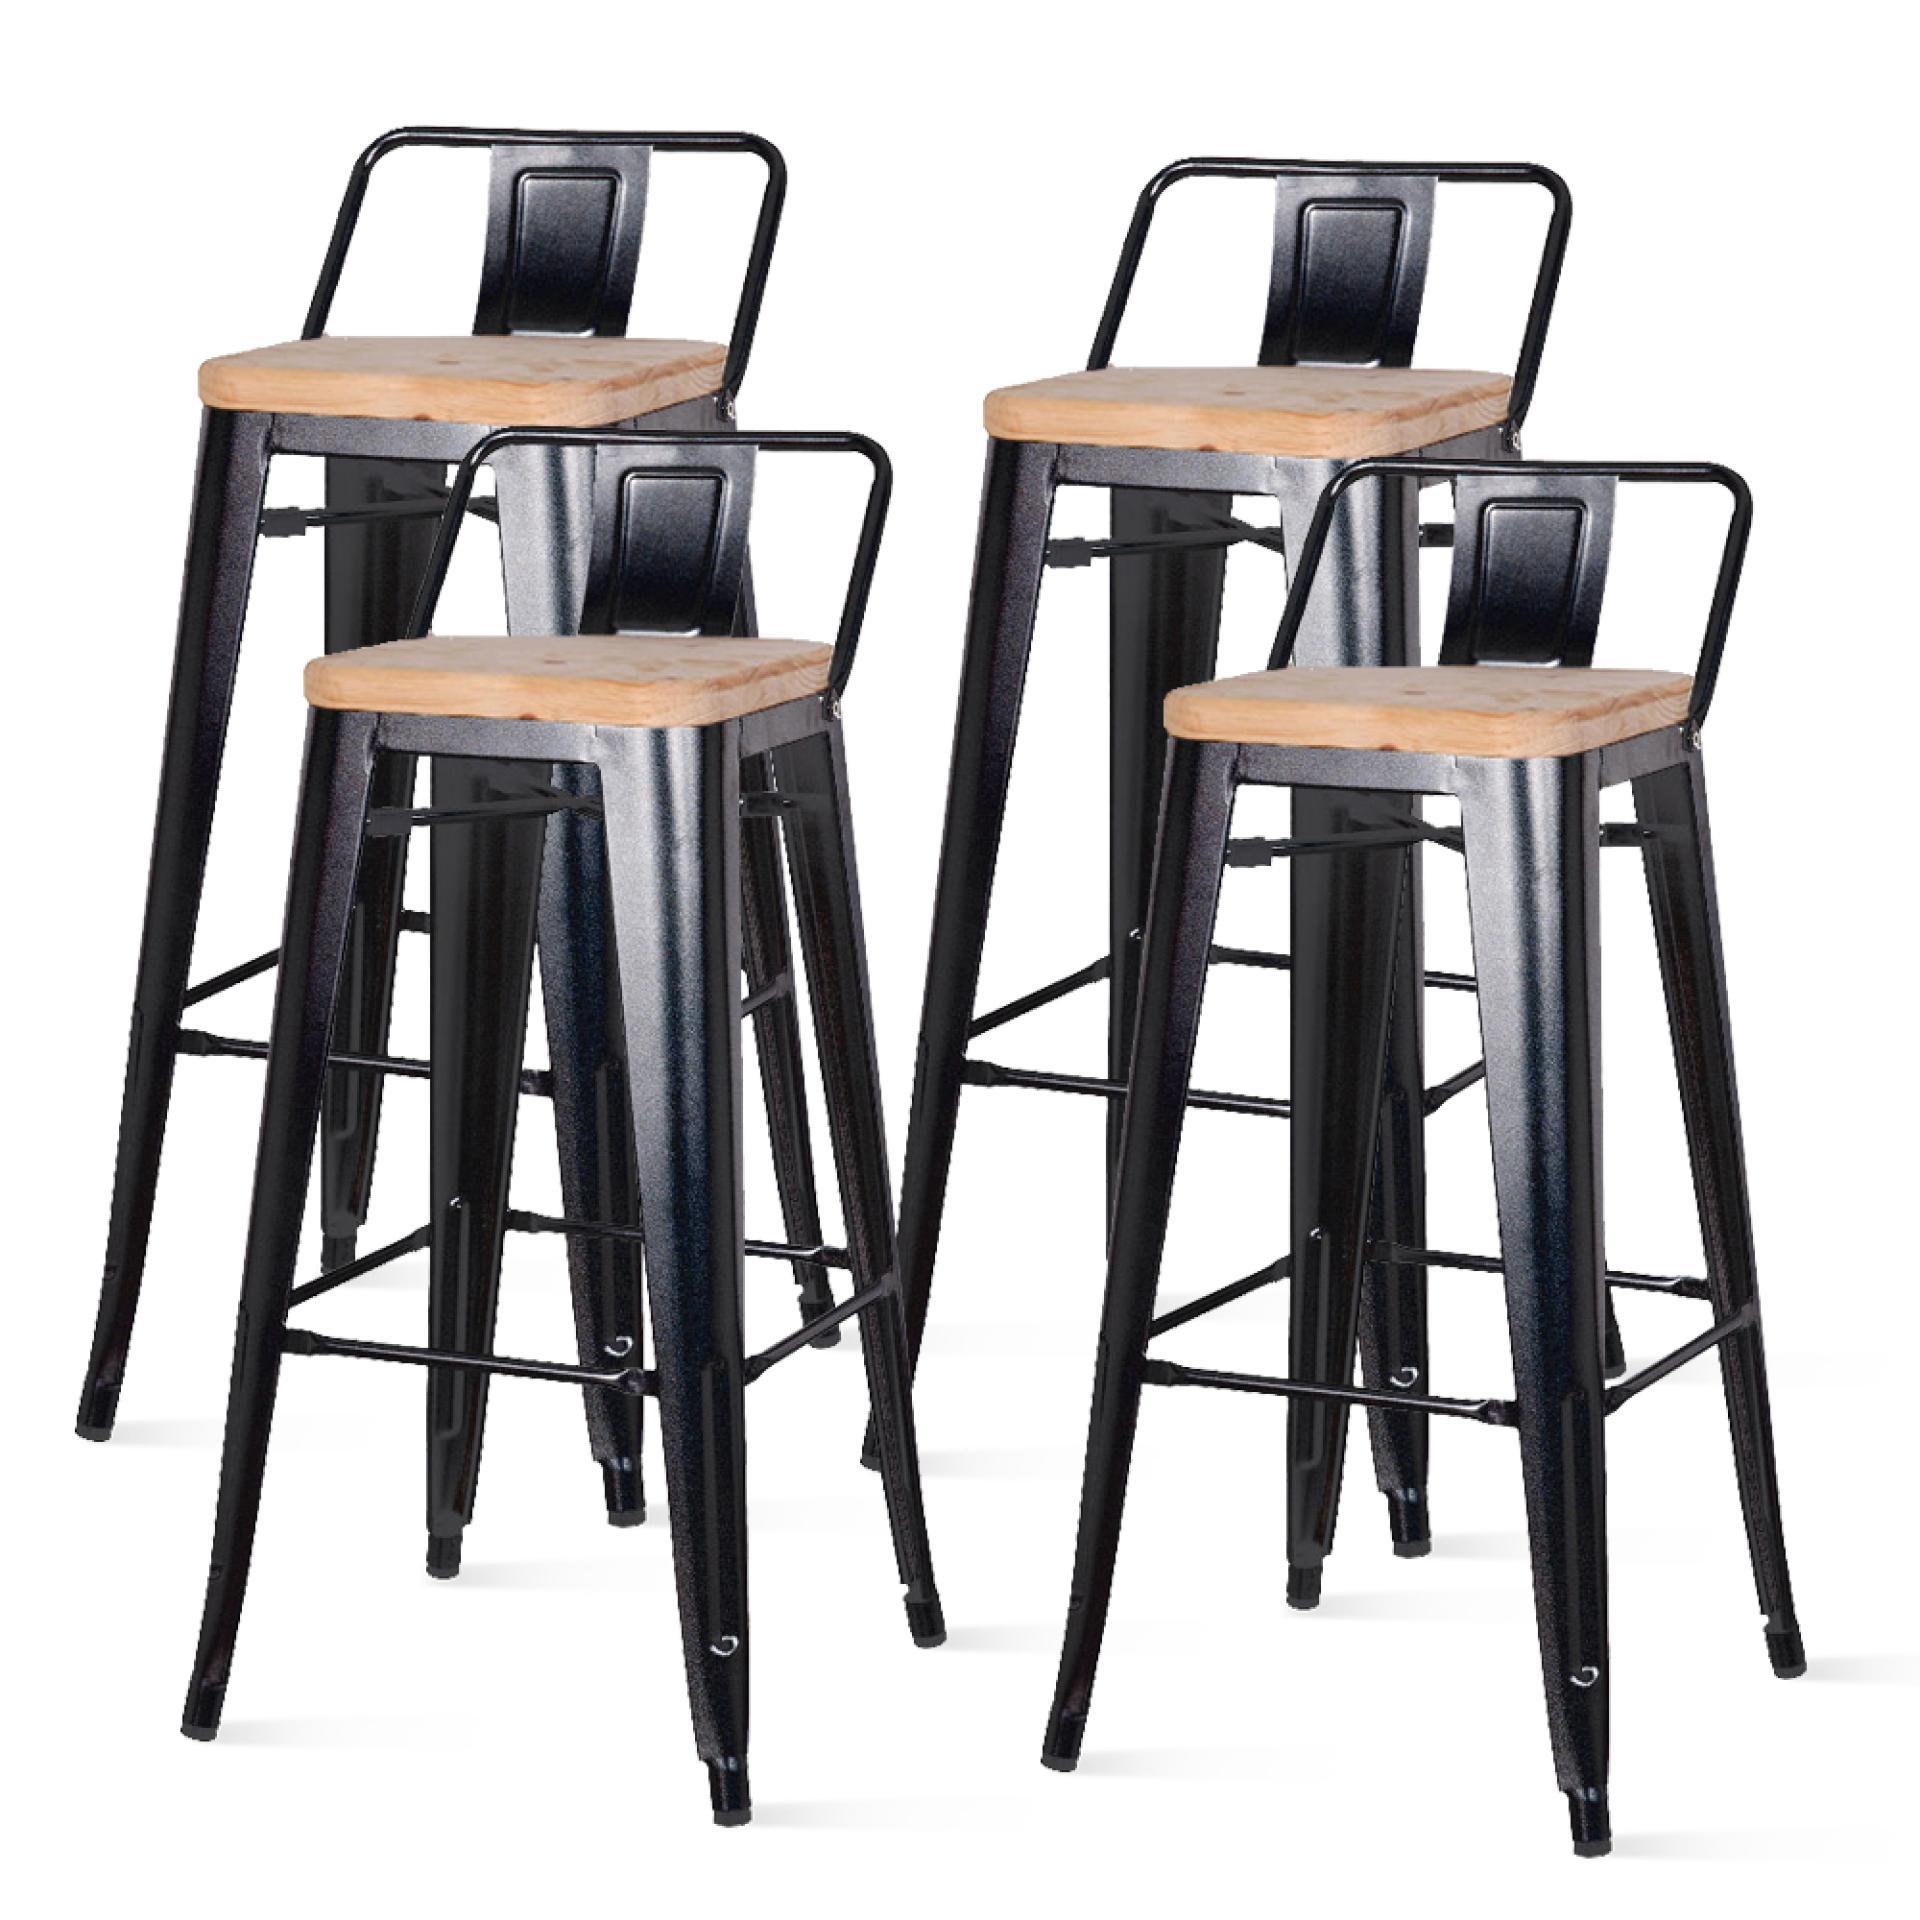 938537 B Npd Home Furniture Wholesale Lifestyle